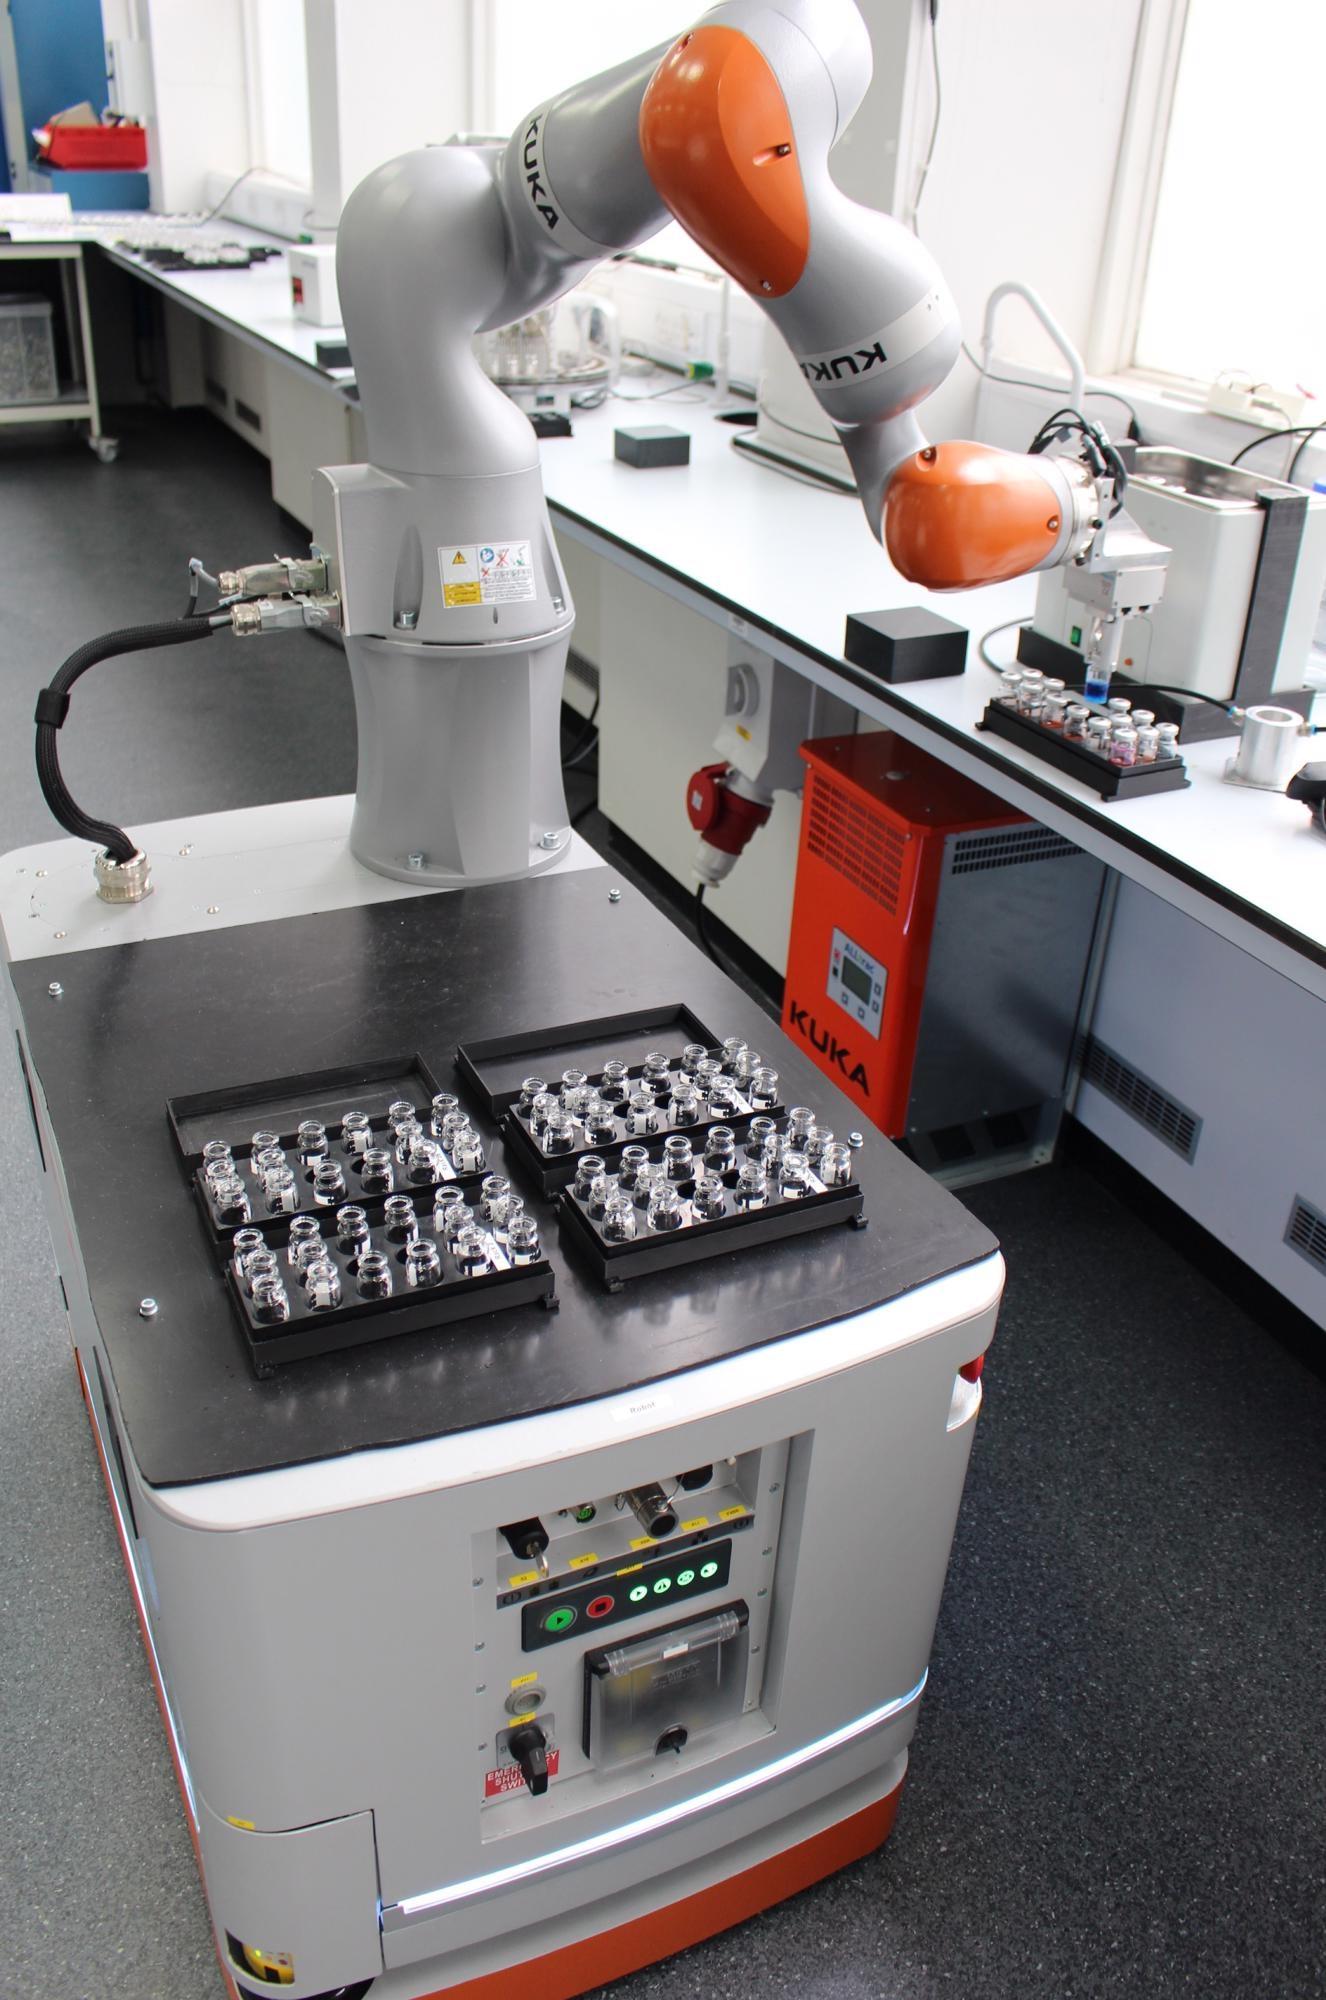 robot chemist, lab automation